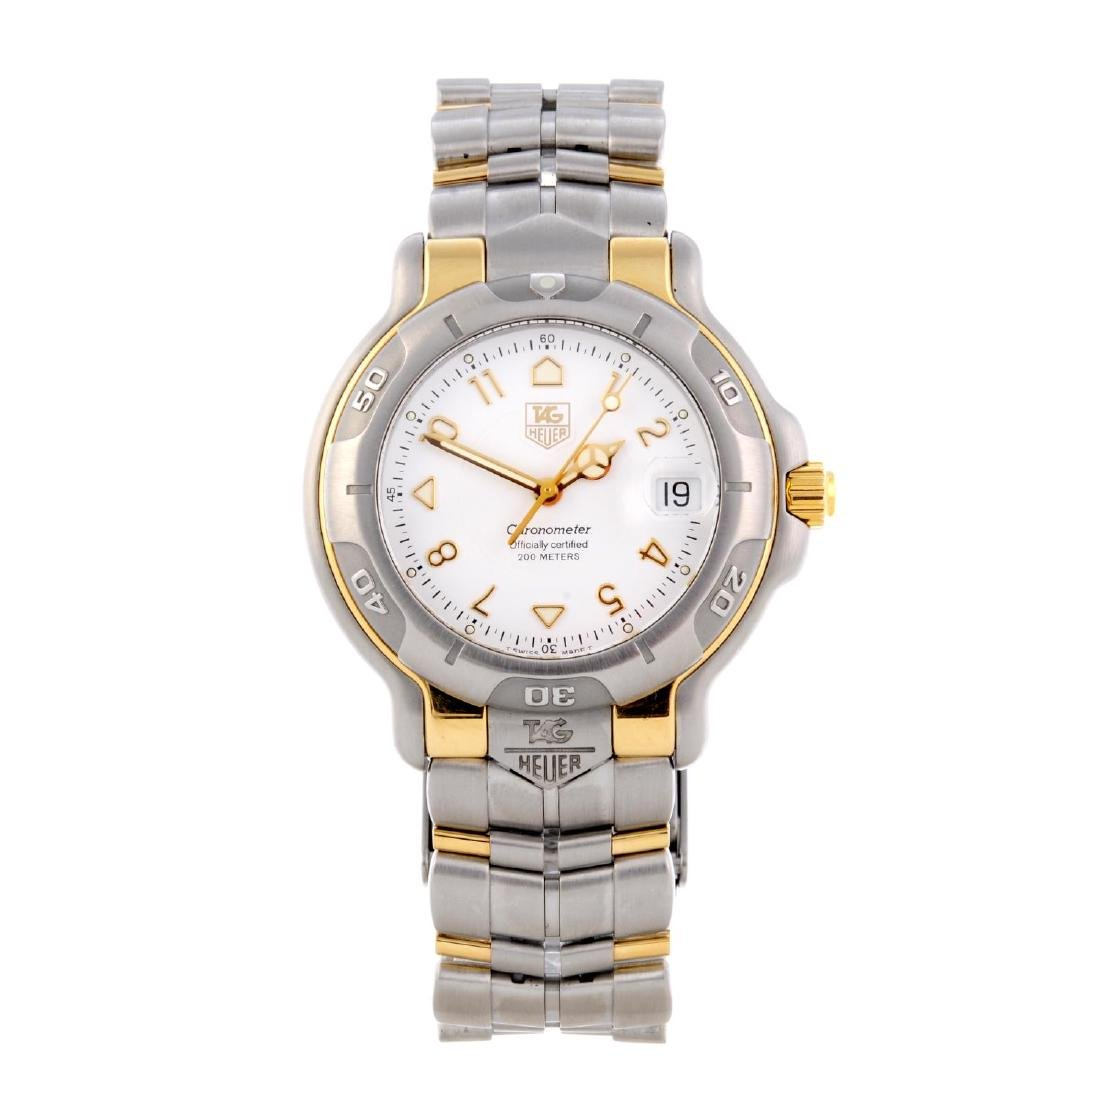 TAG HEUER - a gentleman's 6000 Series bracelet watch.